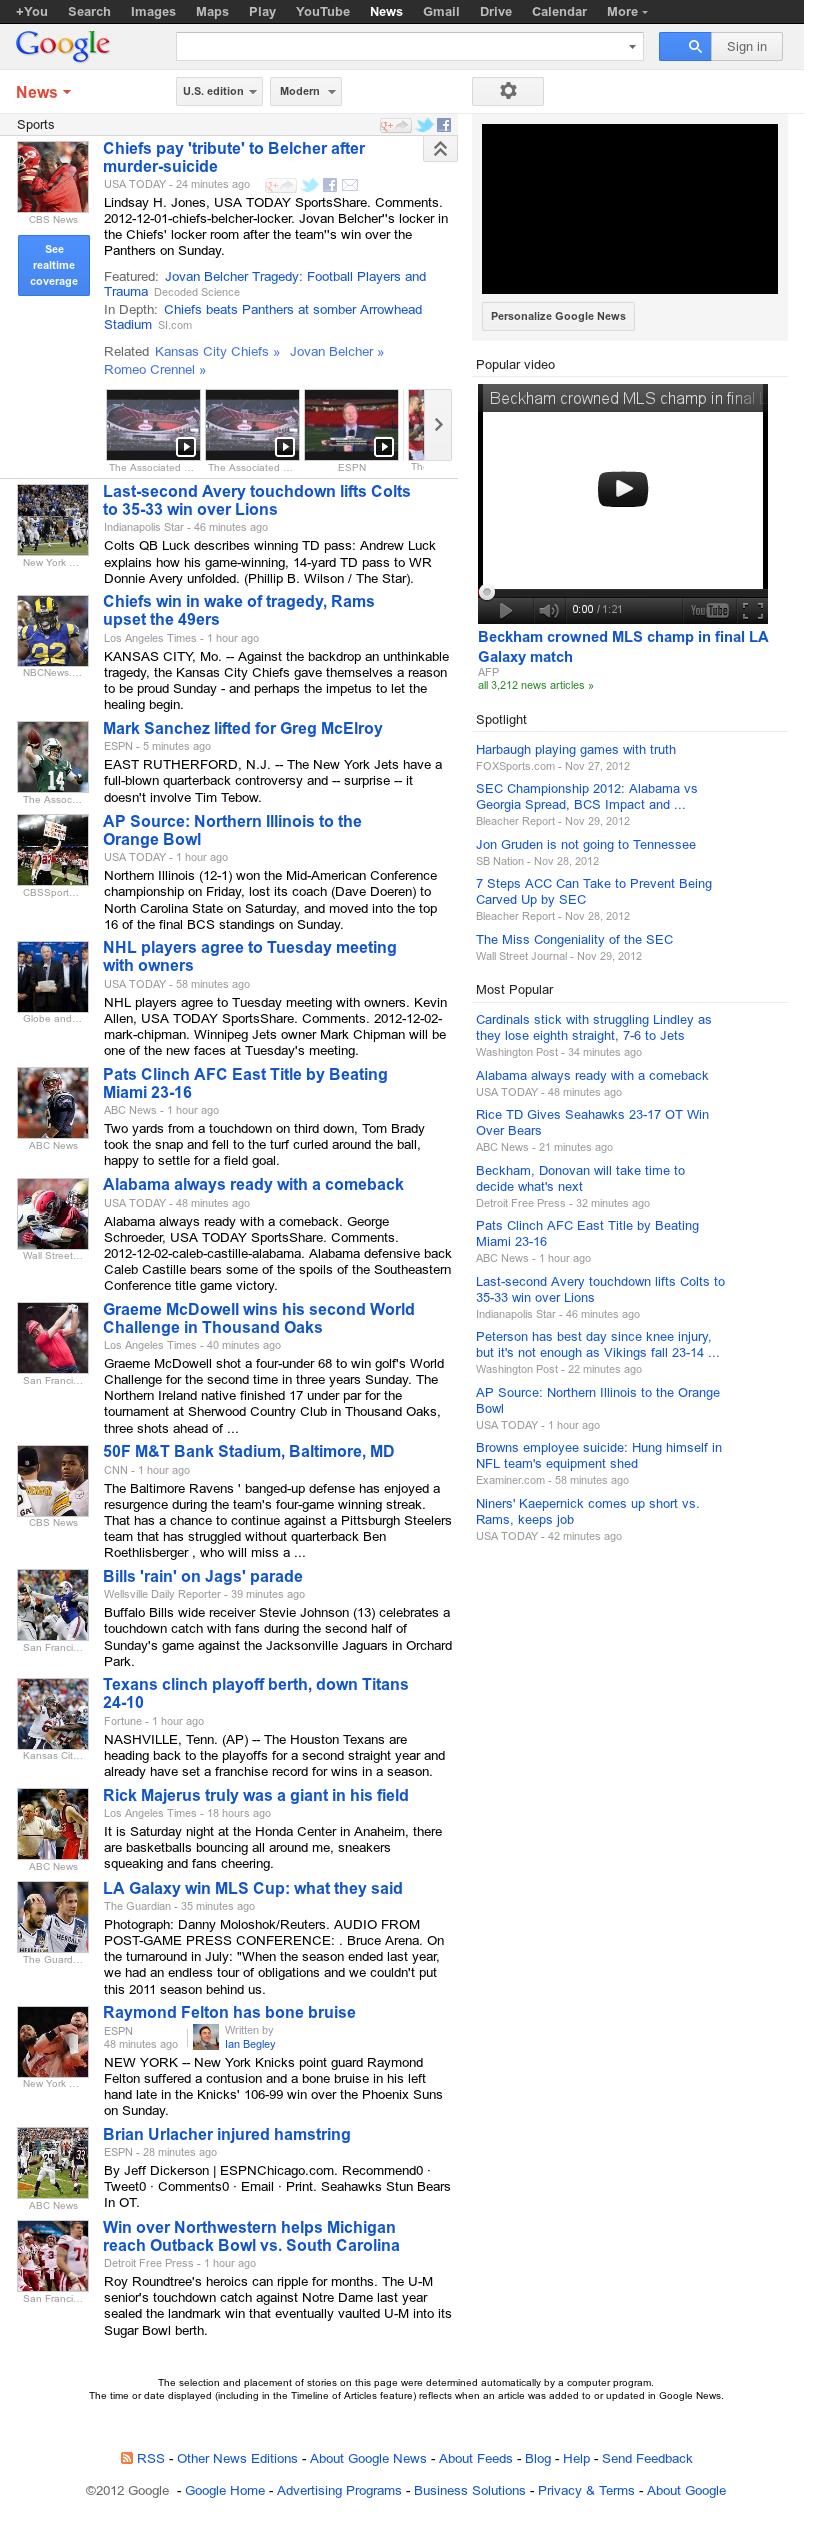 Google News: Sports at Monday Dec. 3, 2012, 12:12 a.m. UTC